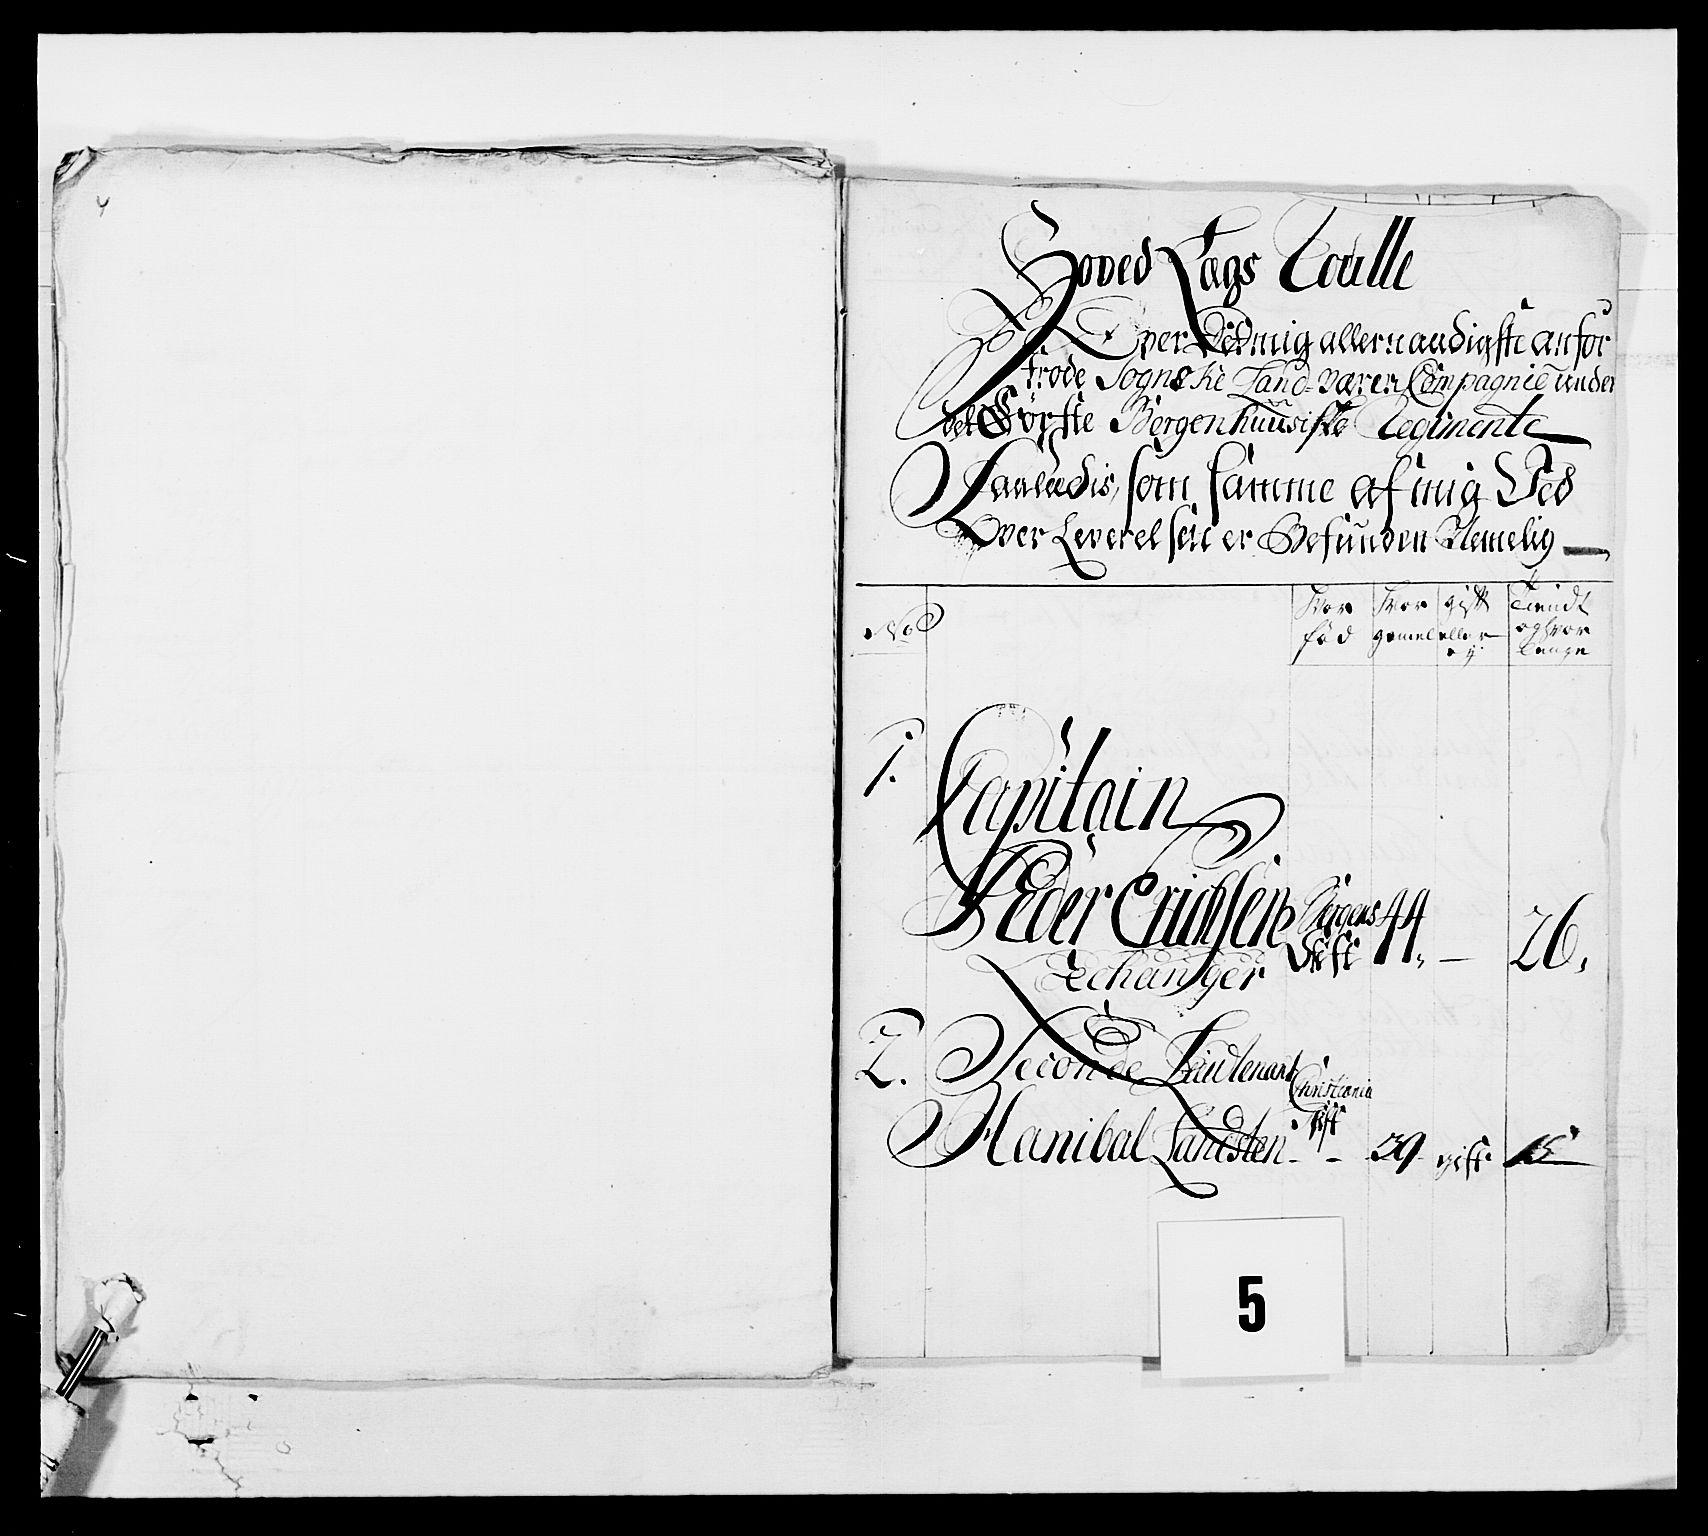 RA, Kommanderende general (KG I) med Det norske krigsdirektorium, E/Ea/L0517: 1. Bergenhusiske regiment, 1742-1756, s. 23